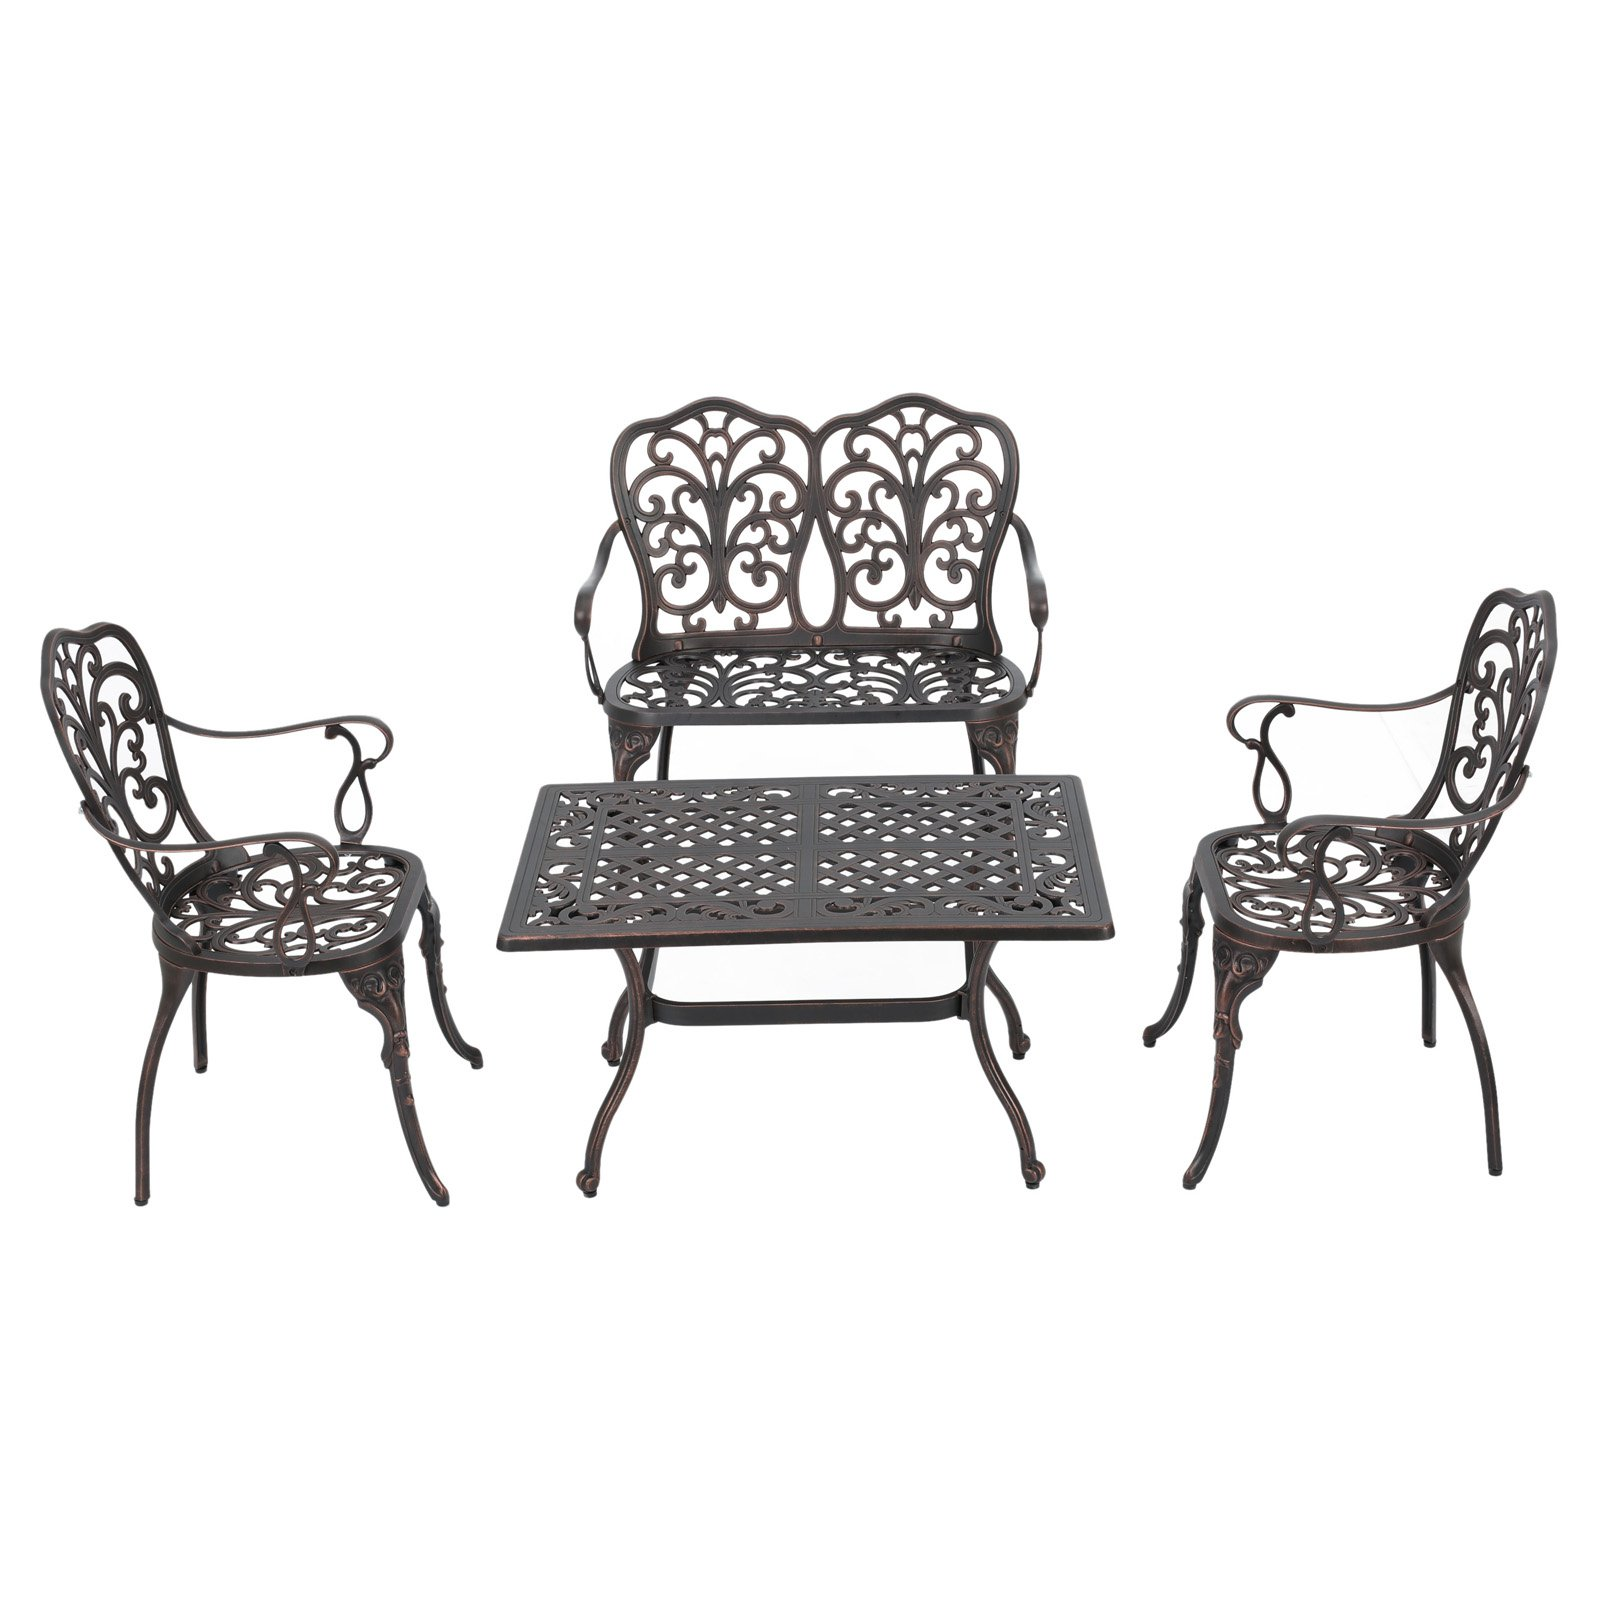 Powder Hill Cast Aluminum 4 Piece Patio Conversation Set by Best Selling Home Decor Furniture LLC